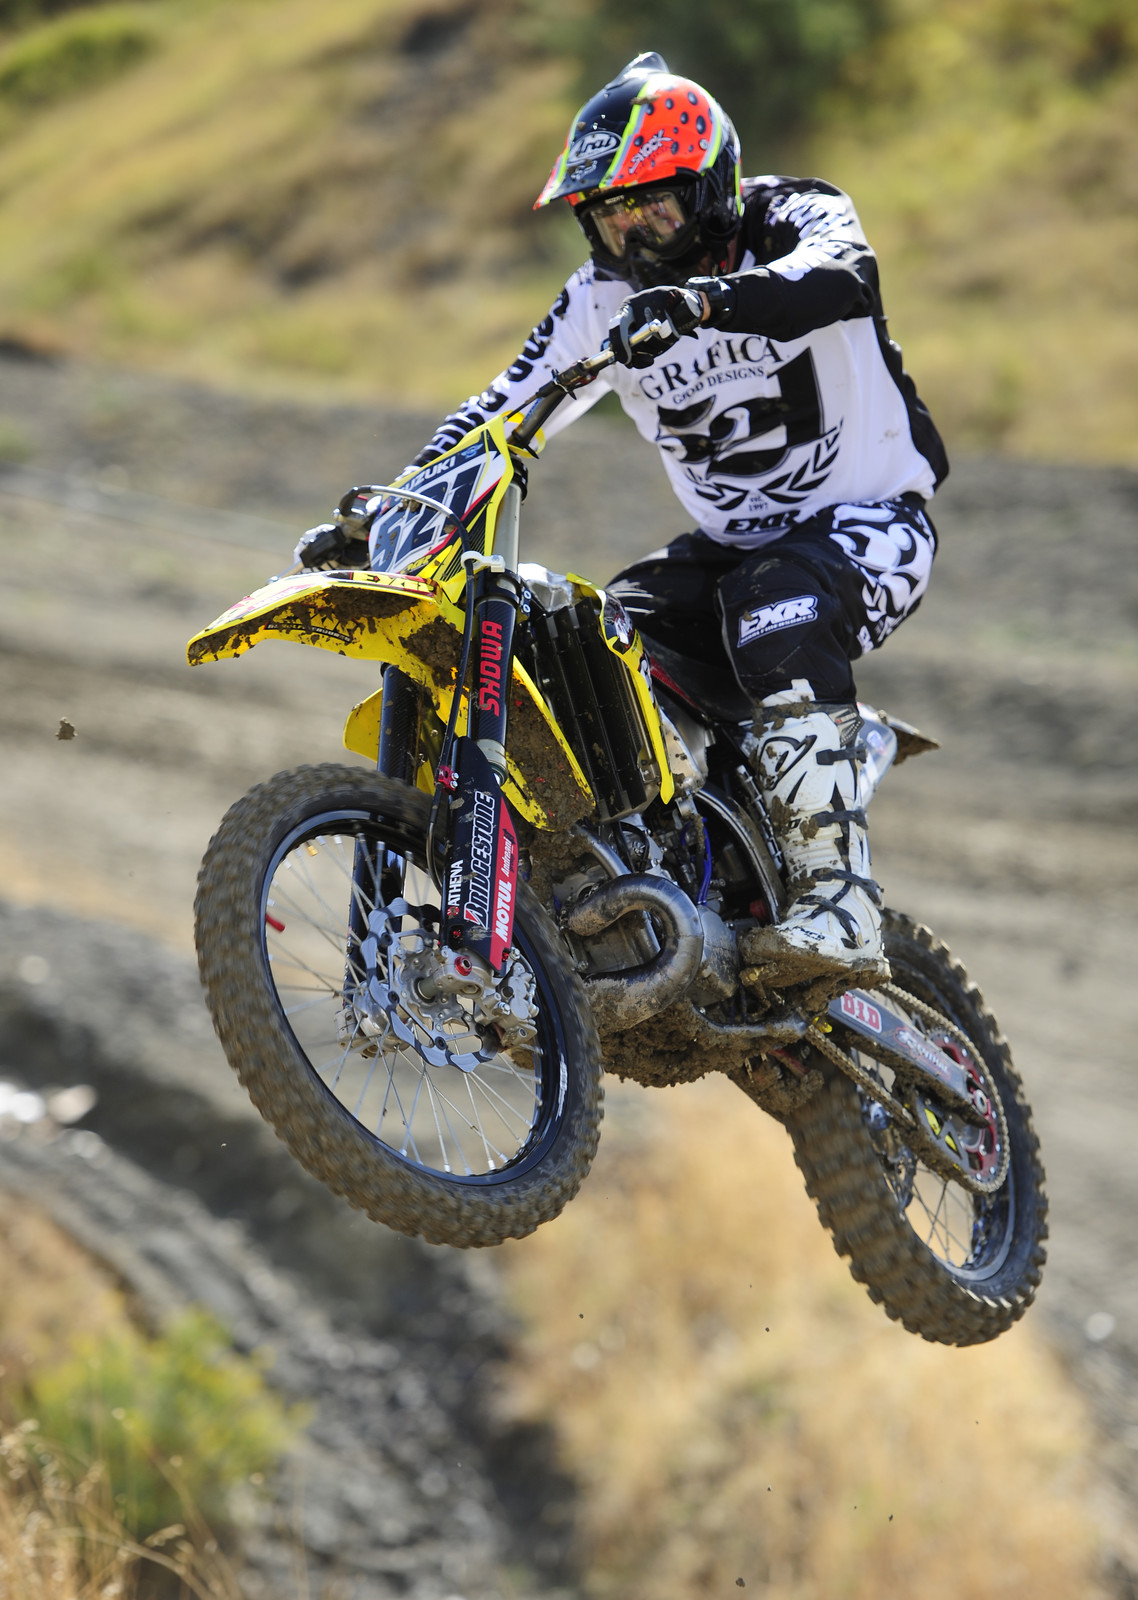 buona - effettoxtremo - Motocross Pictures - Vital MX